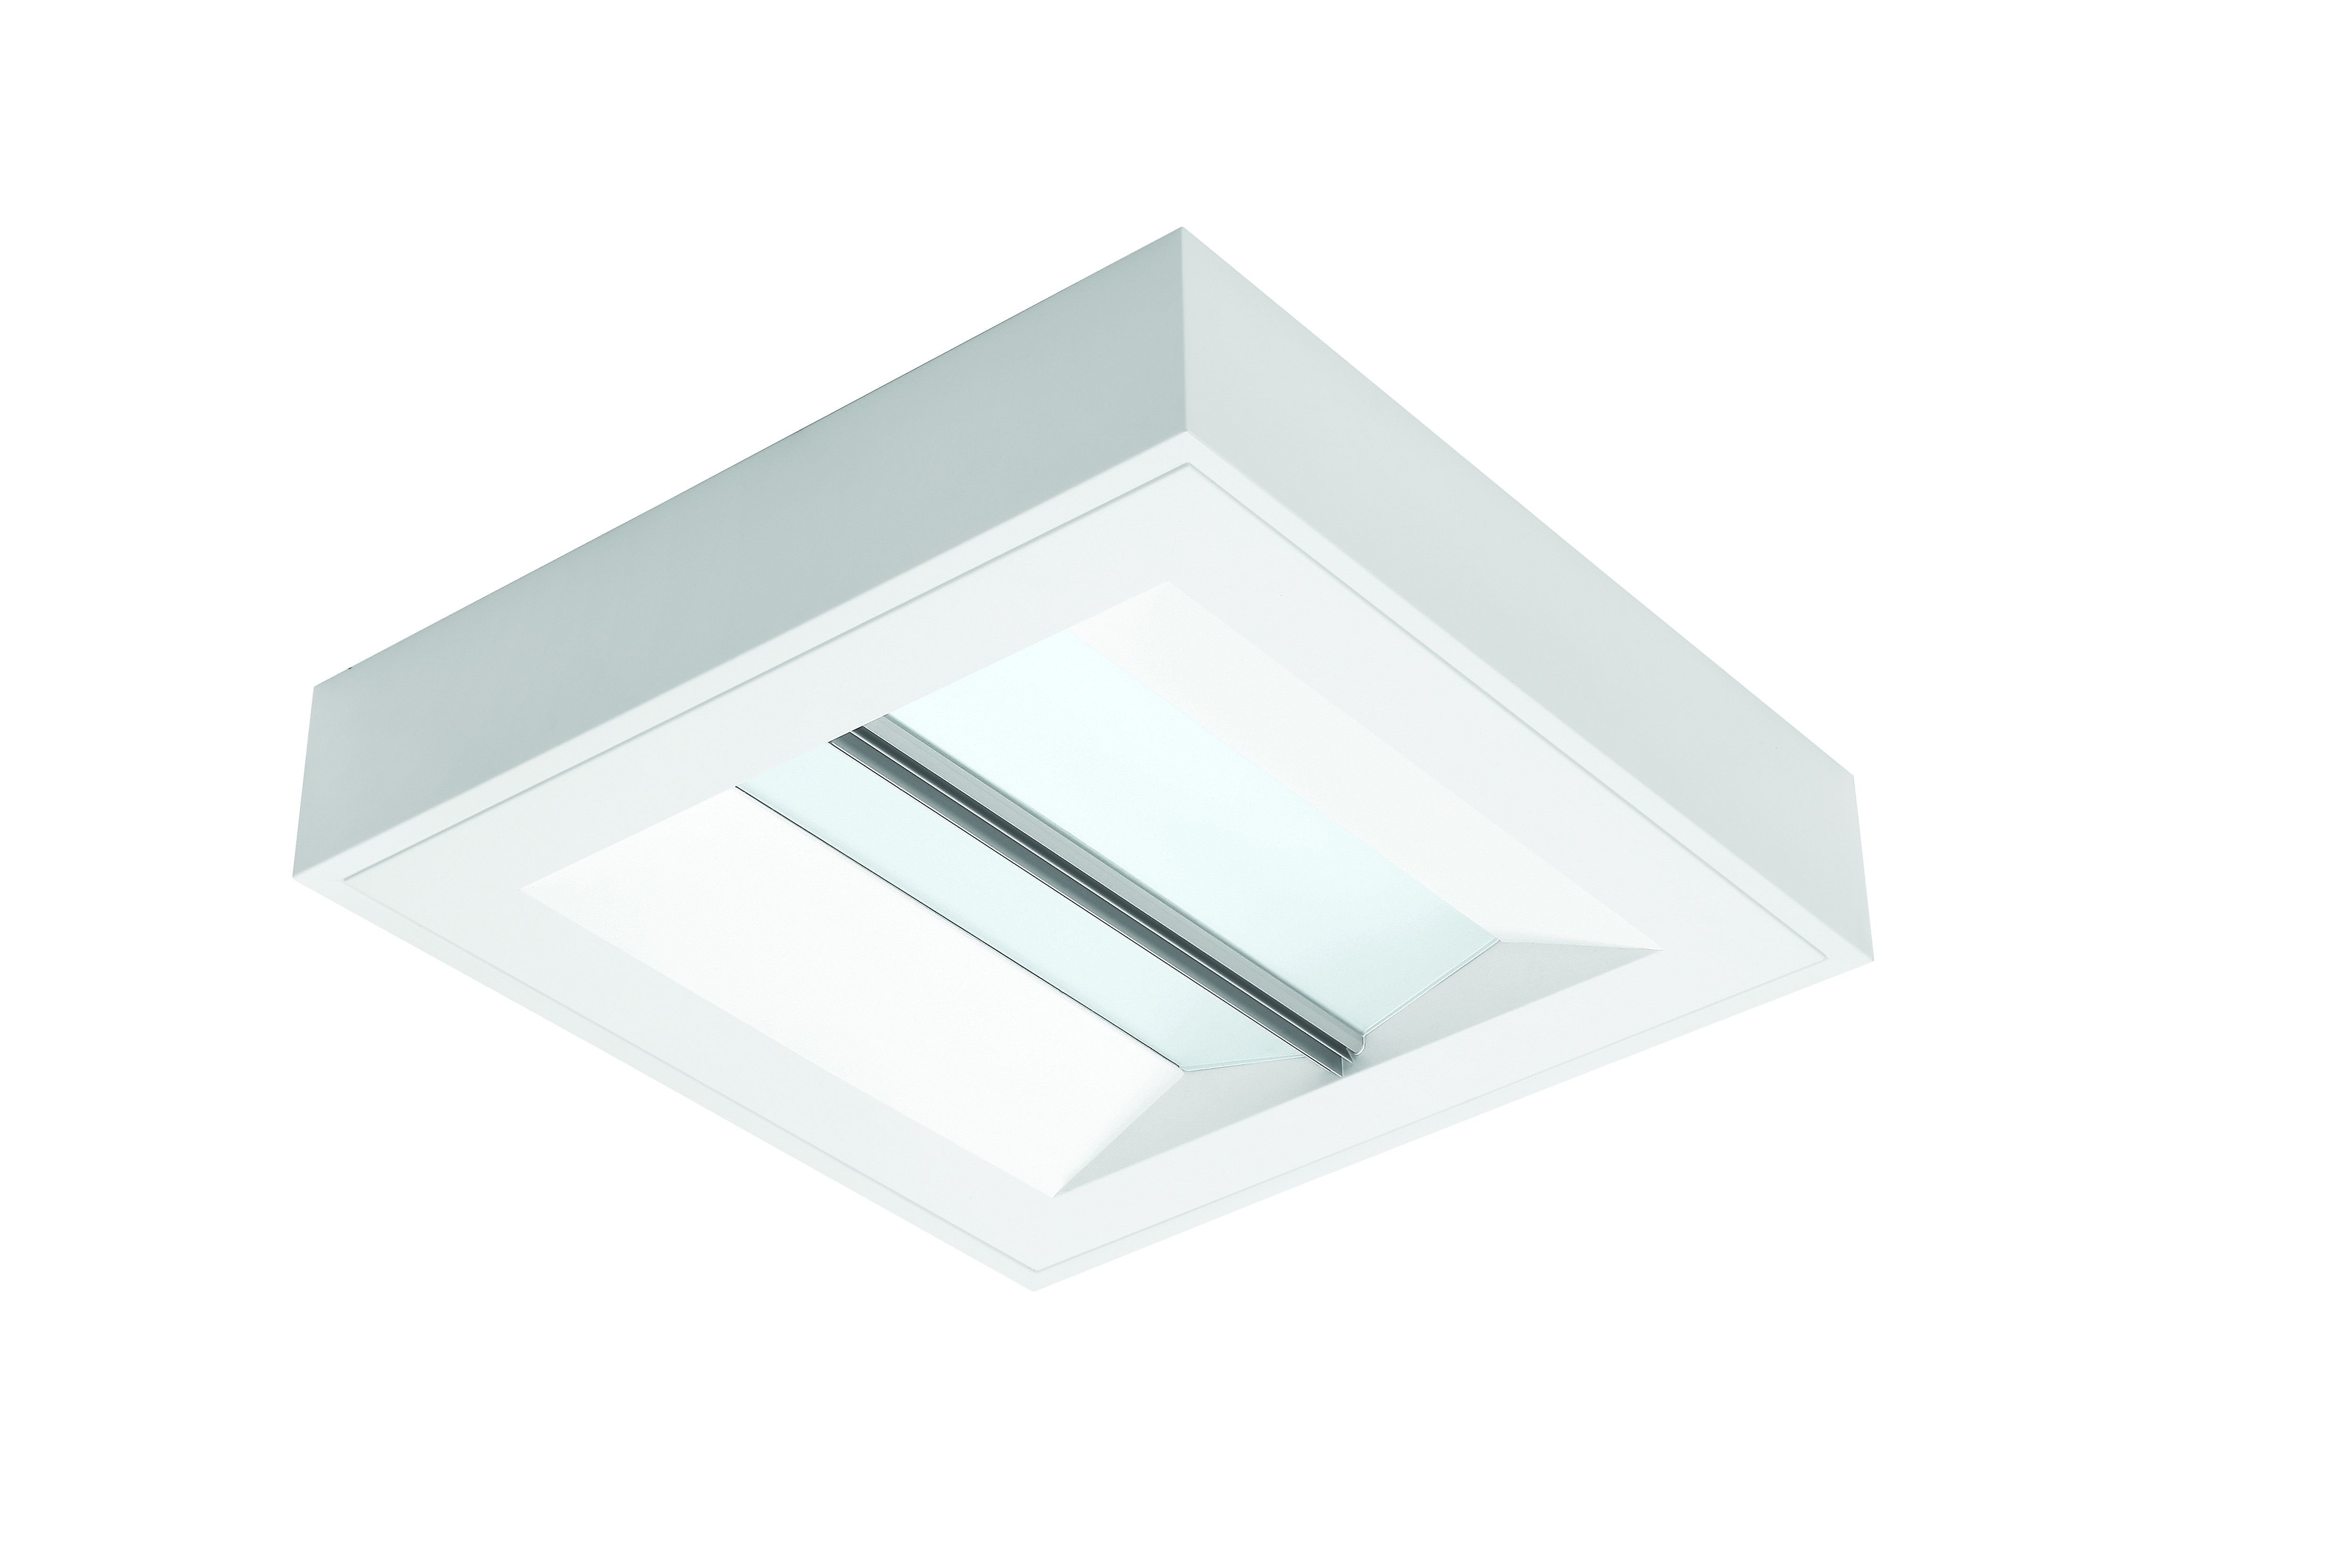 Led leuchten led spots led leuchtmittel und vieles mehr for Led spots deckenbeleuchtung